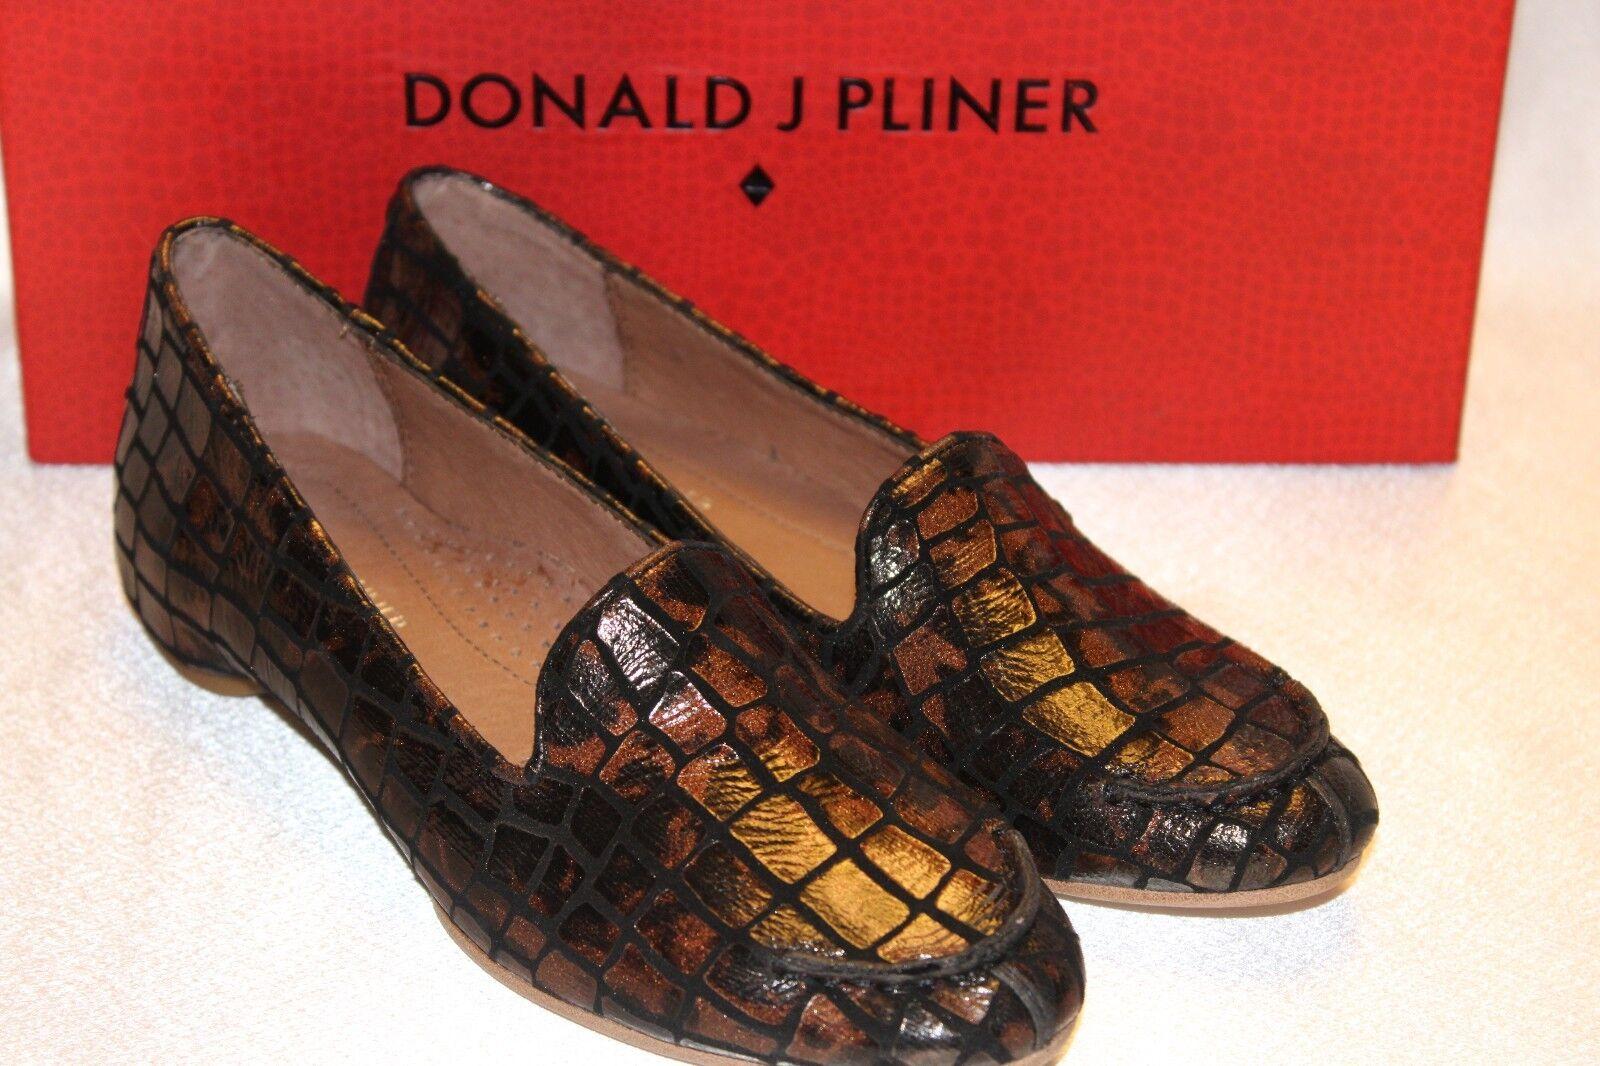 NEW  NIB Donald J Pliner BENGI Bronze Croco Patent Leather Smoking Loafer 5  195